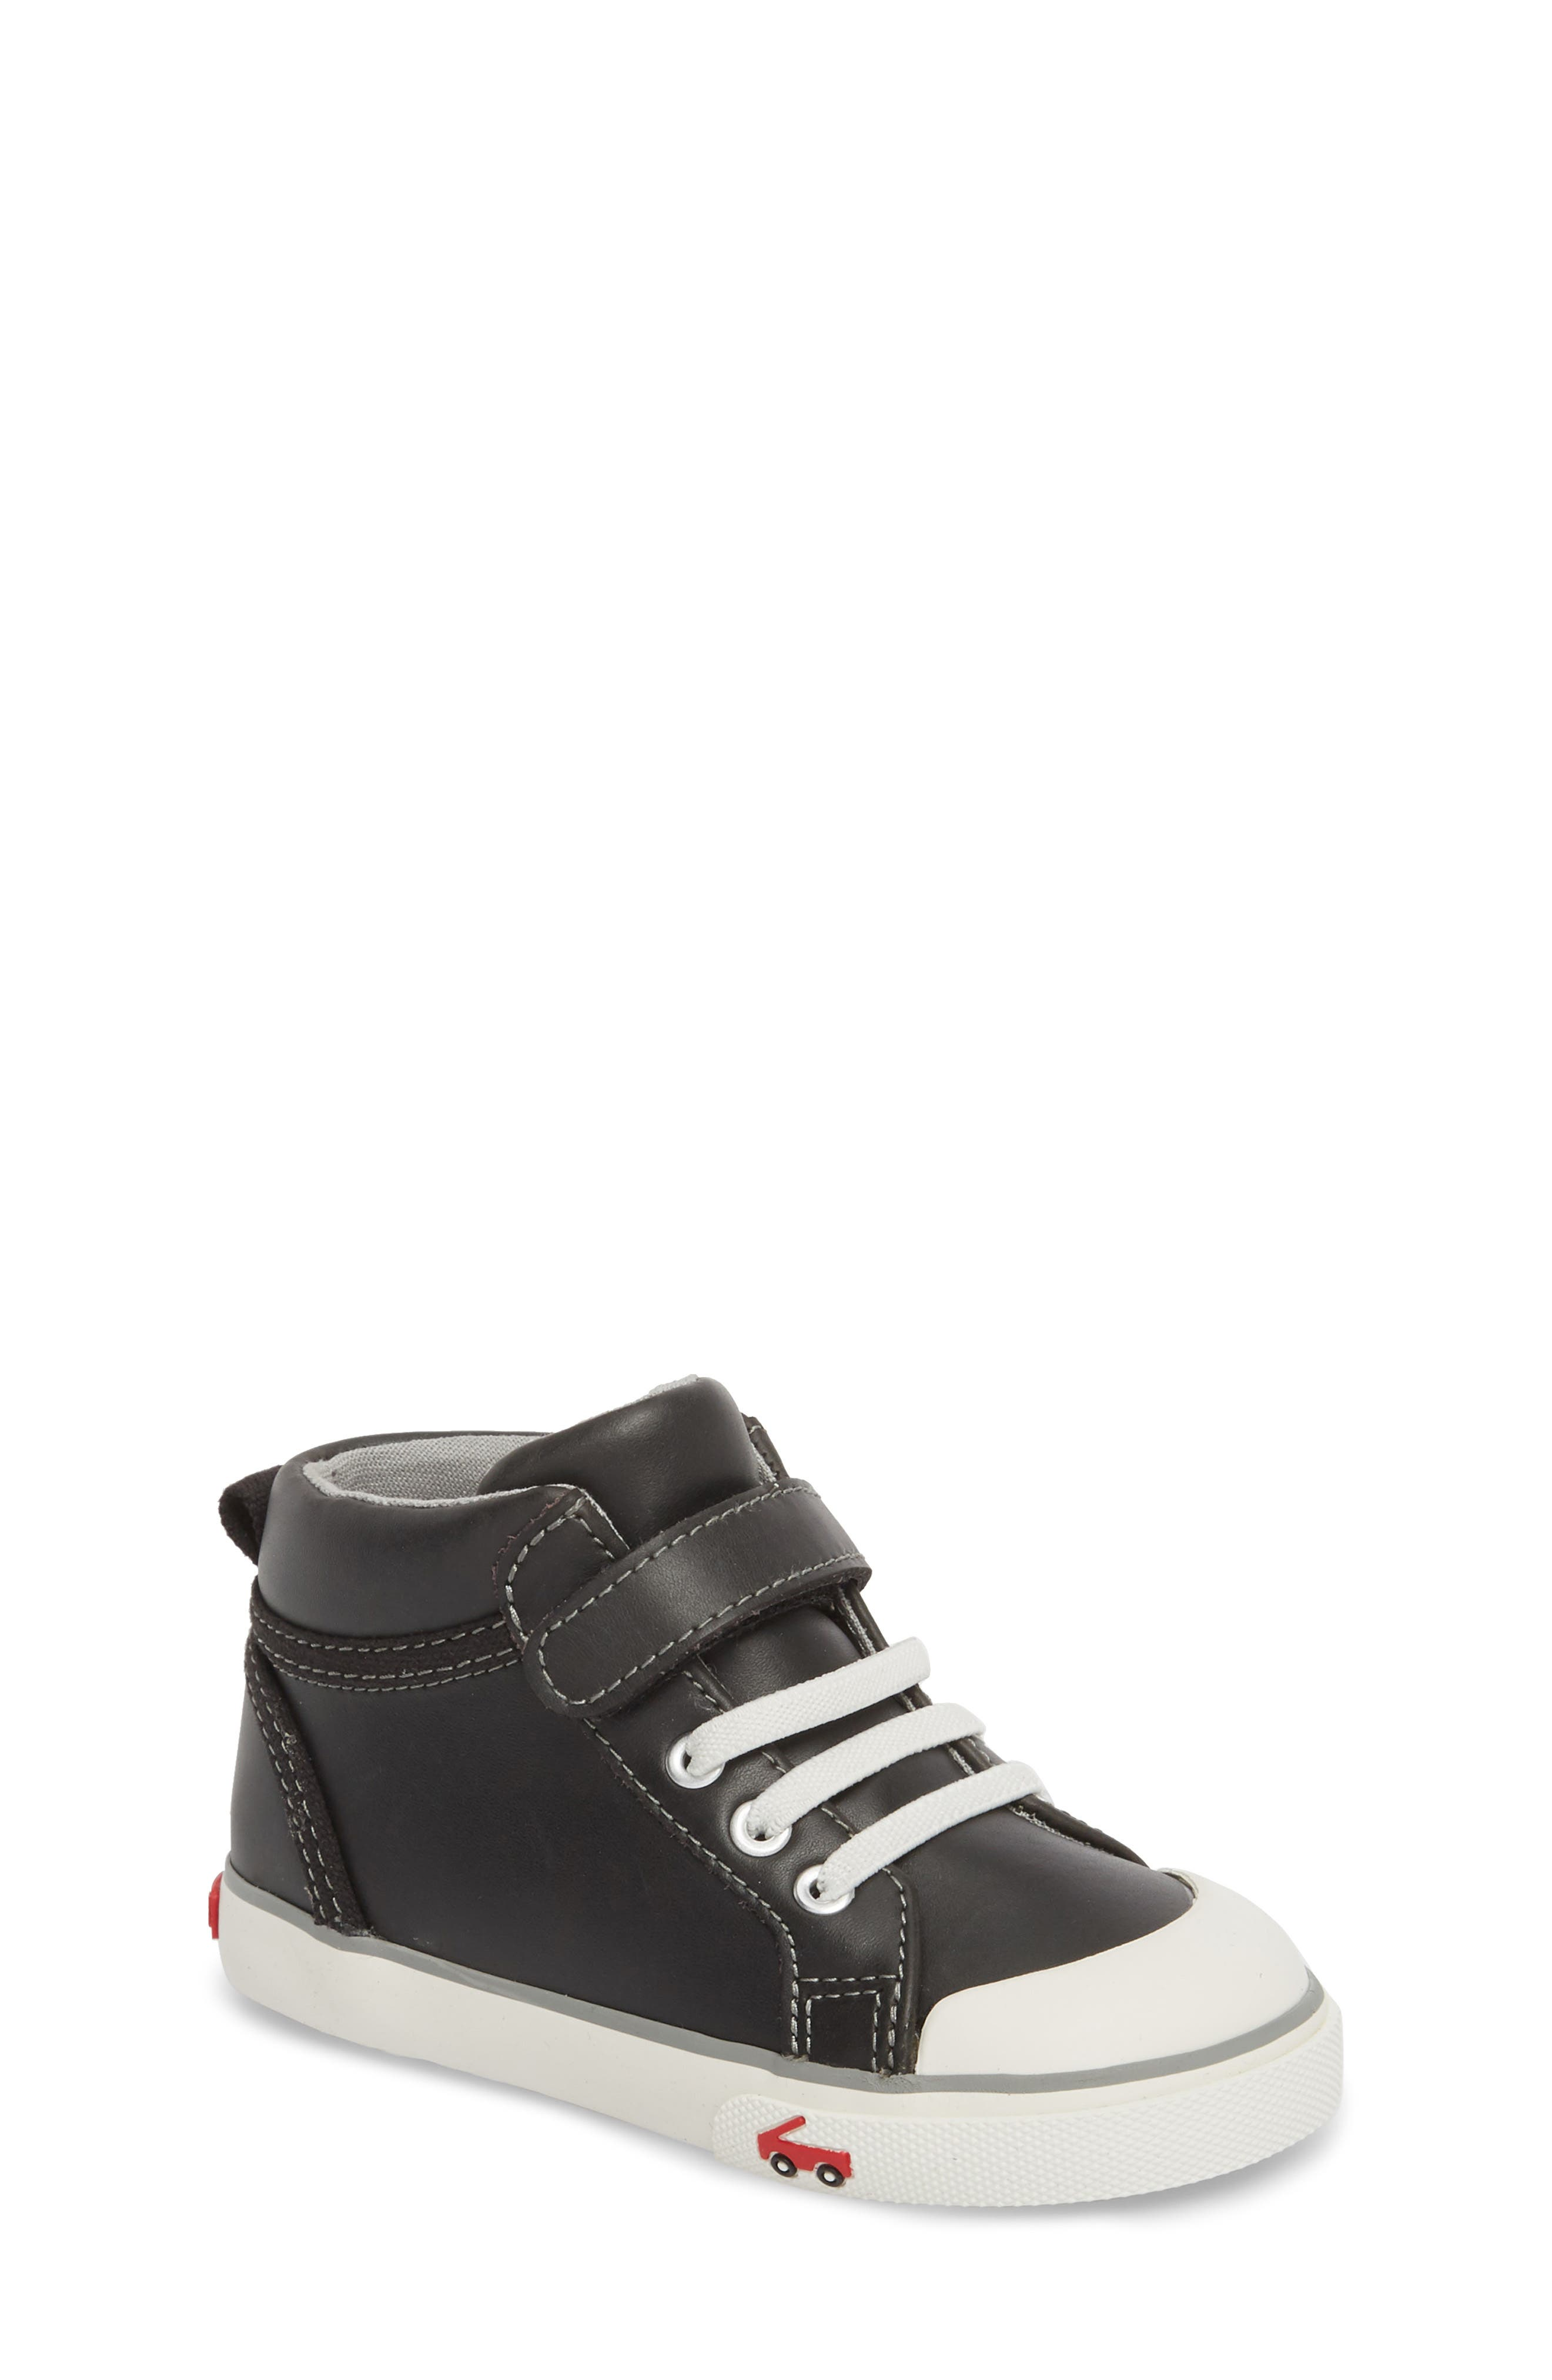 SEE KAI RUN, Peyton High Top Sneaker, Main thumbnail 1, color, BLACK LEATHER